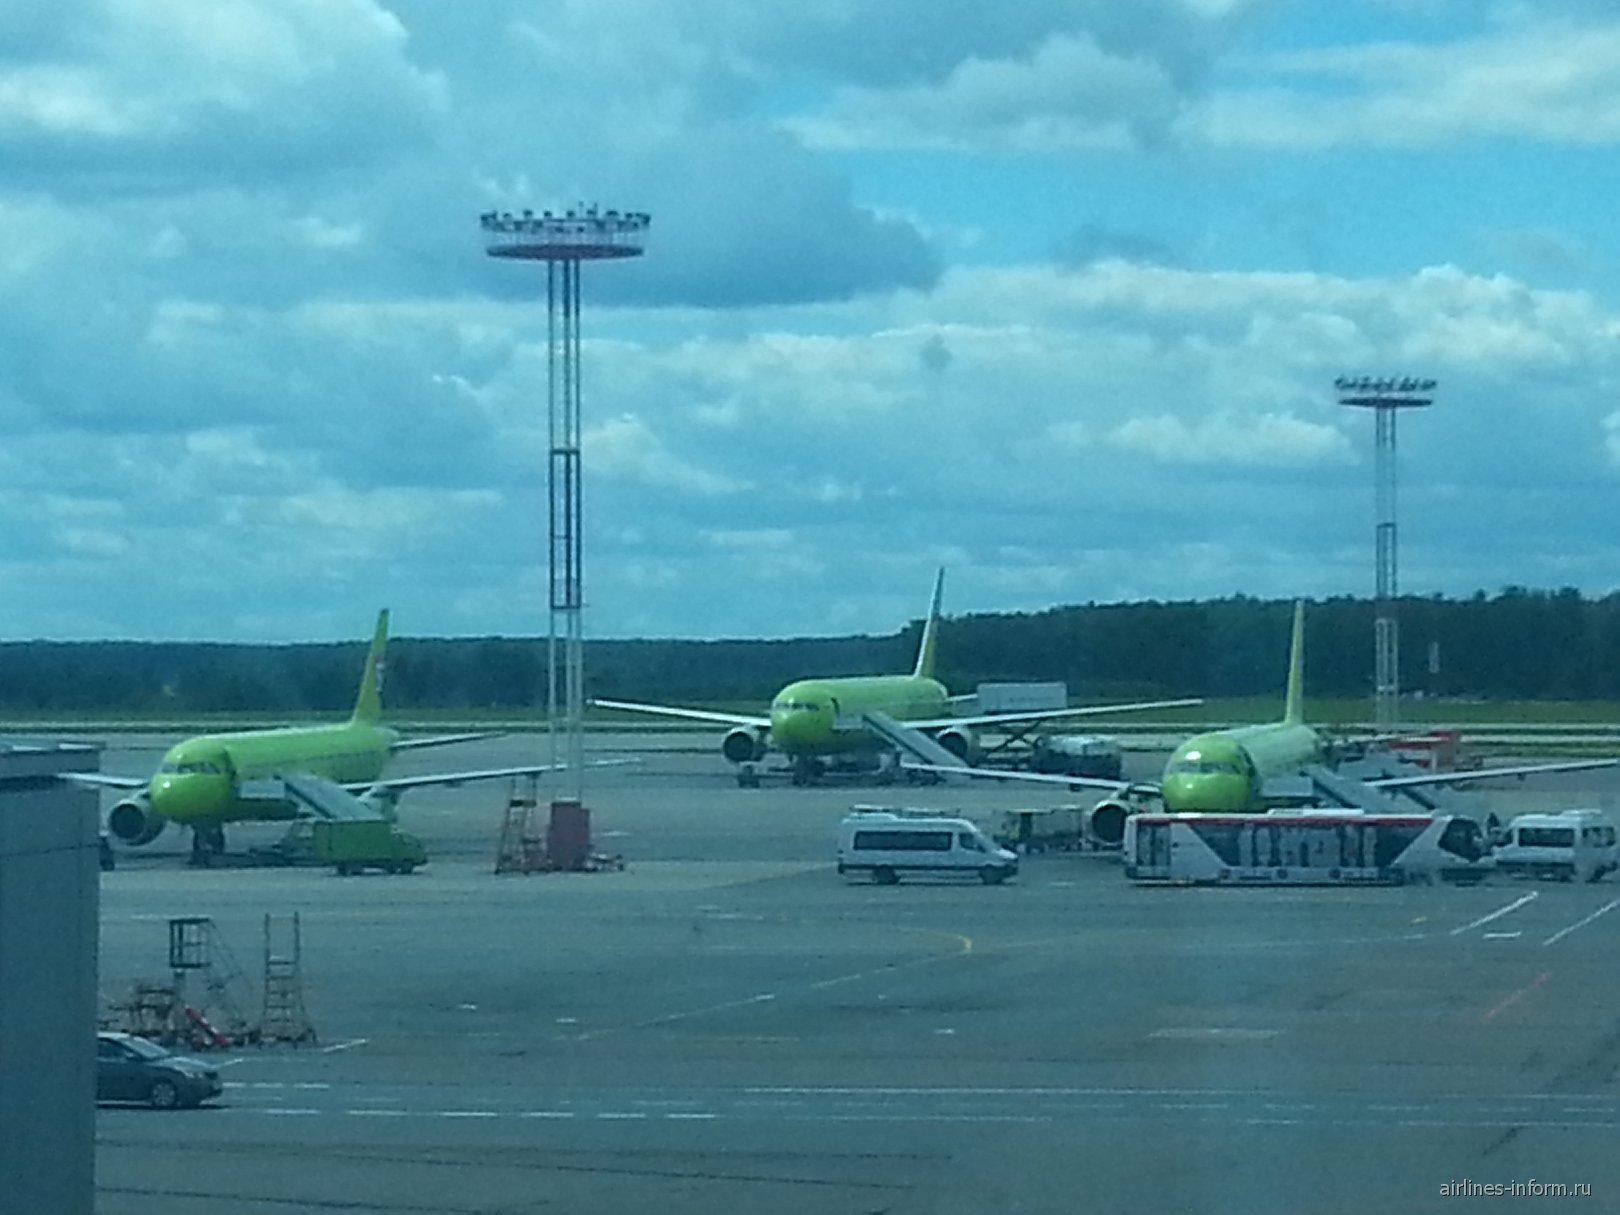 Домодедово аэропорт Википедия